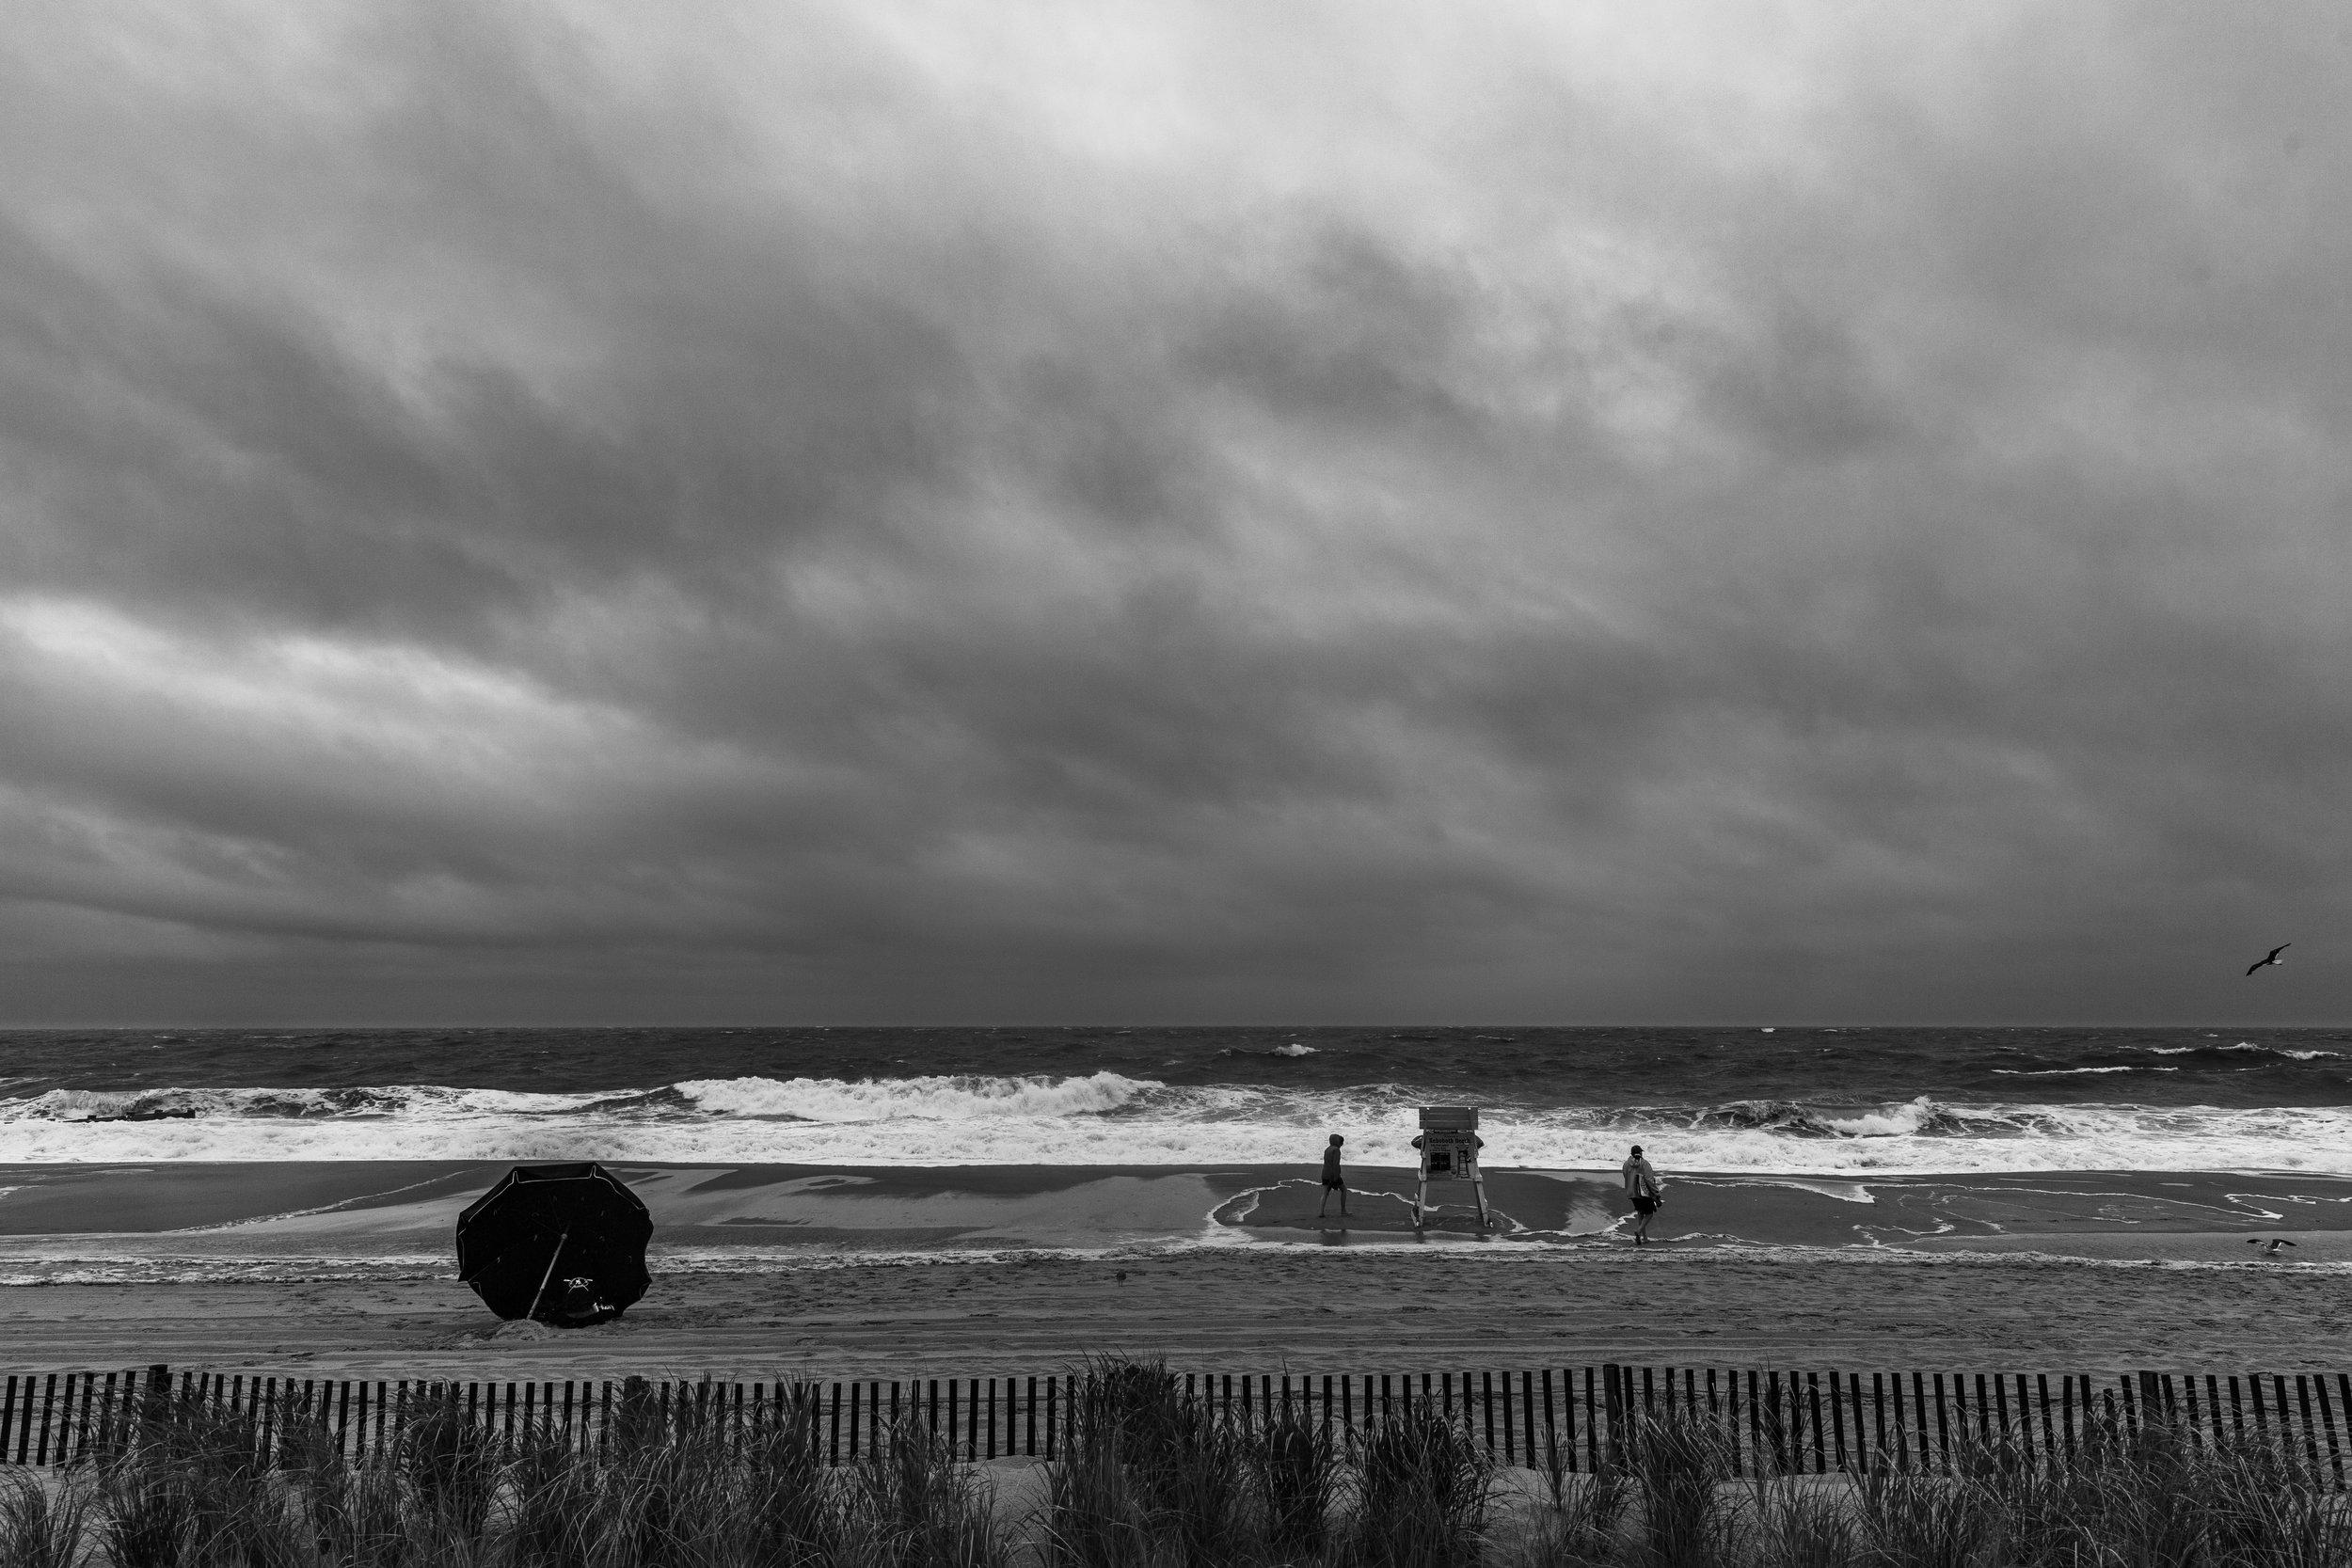 Beachgoers braving the wind, rain and surf